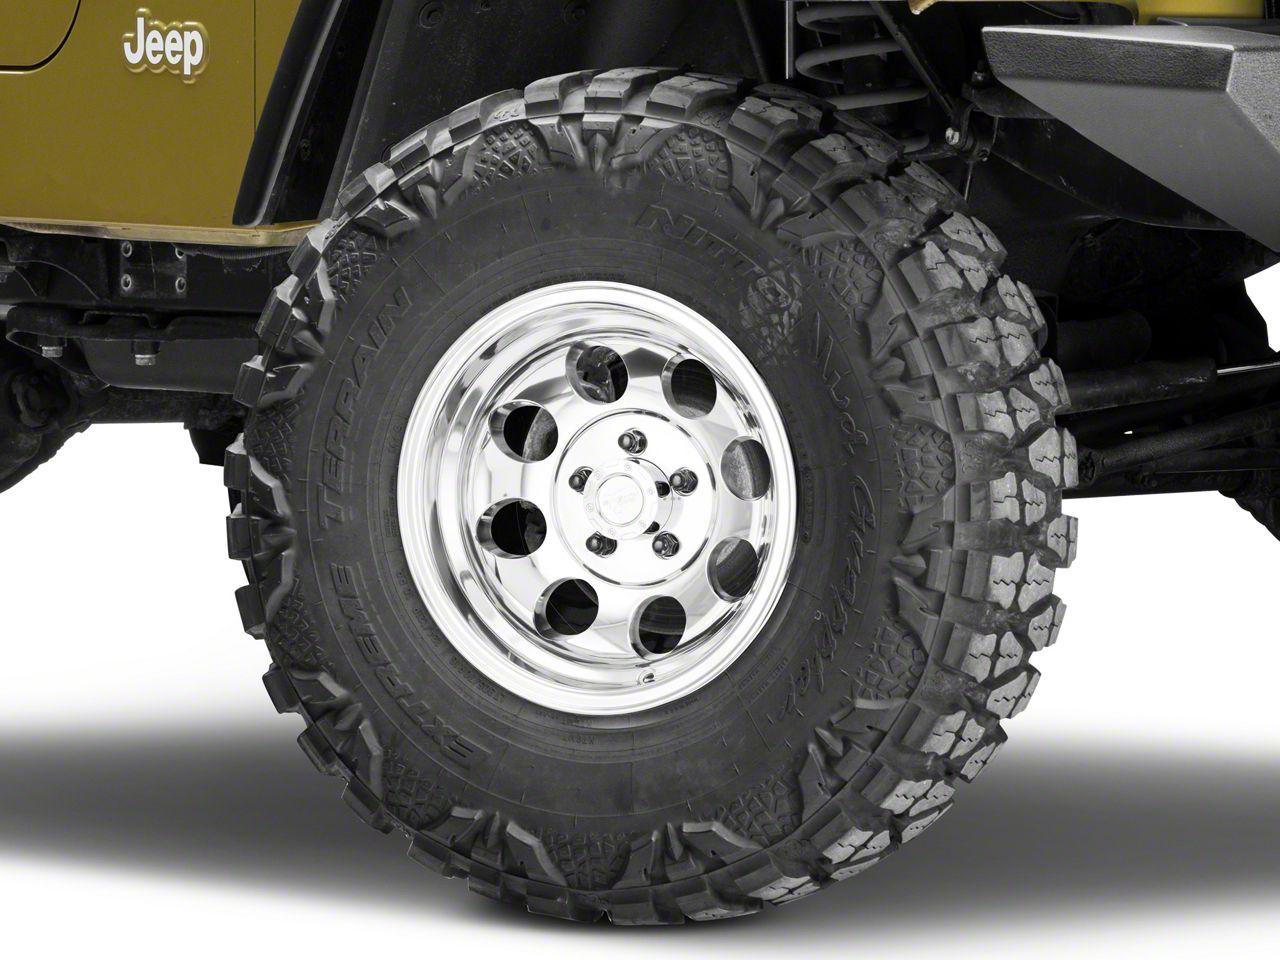 pro p wheels jeep wrangler series 1069 polished wheel 15x8 1069 Green 1999 Jeep Grand Cherokee 4x4 pro p wheels jeep wrangler series 1069 polished wheel 15x8 1069 5865 87 06 jeep wrangler yj tj